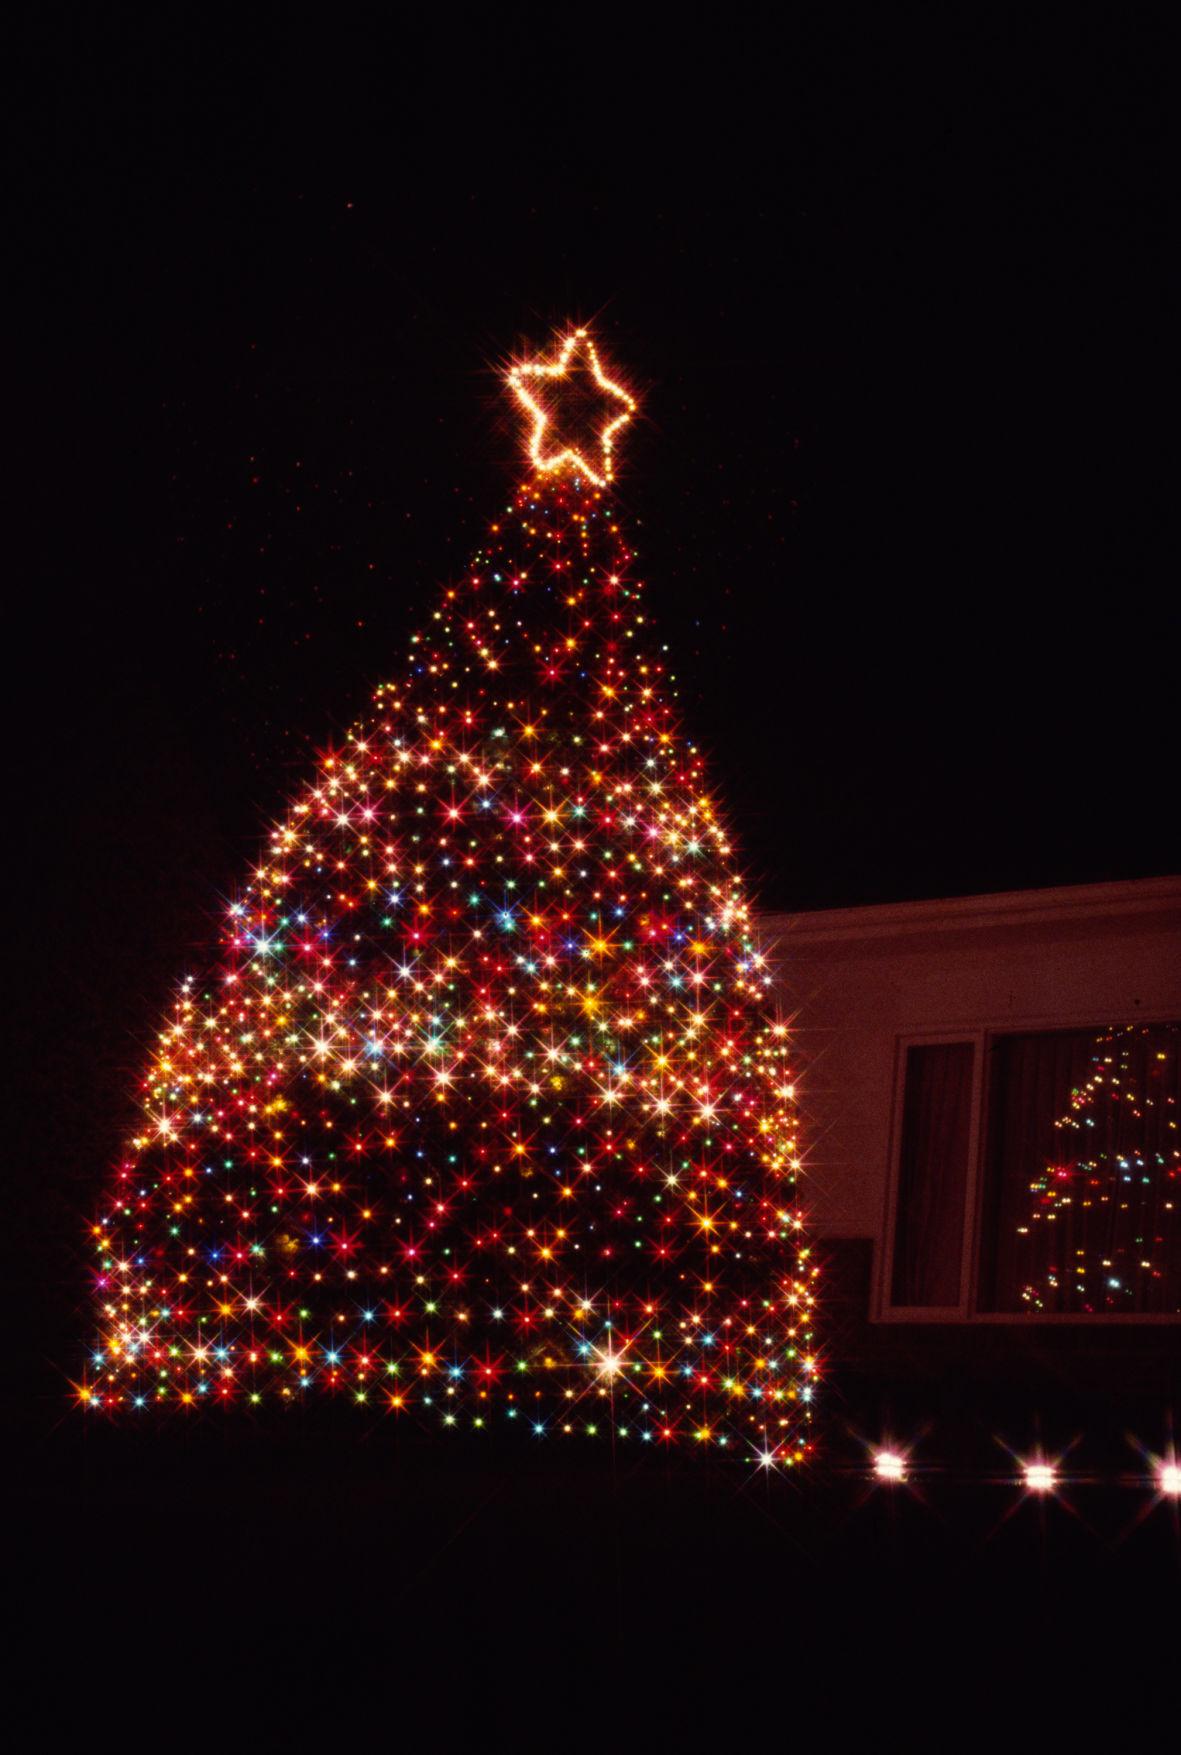 Ghosts of Billings Christmas lights past   Local   billingsgazette.com